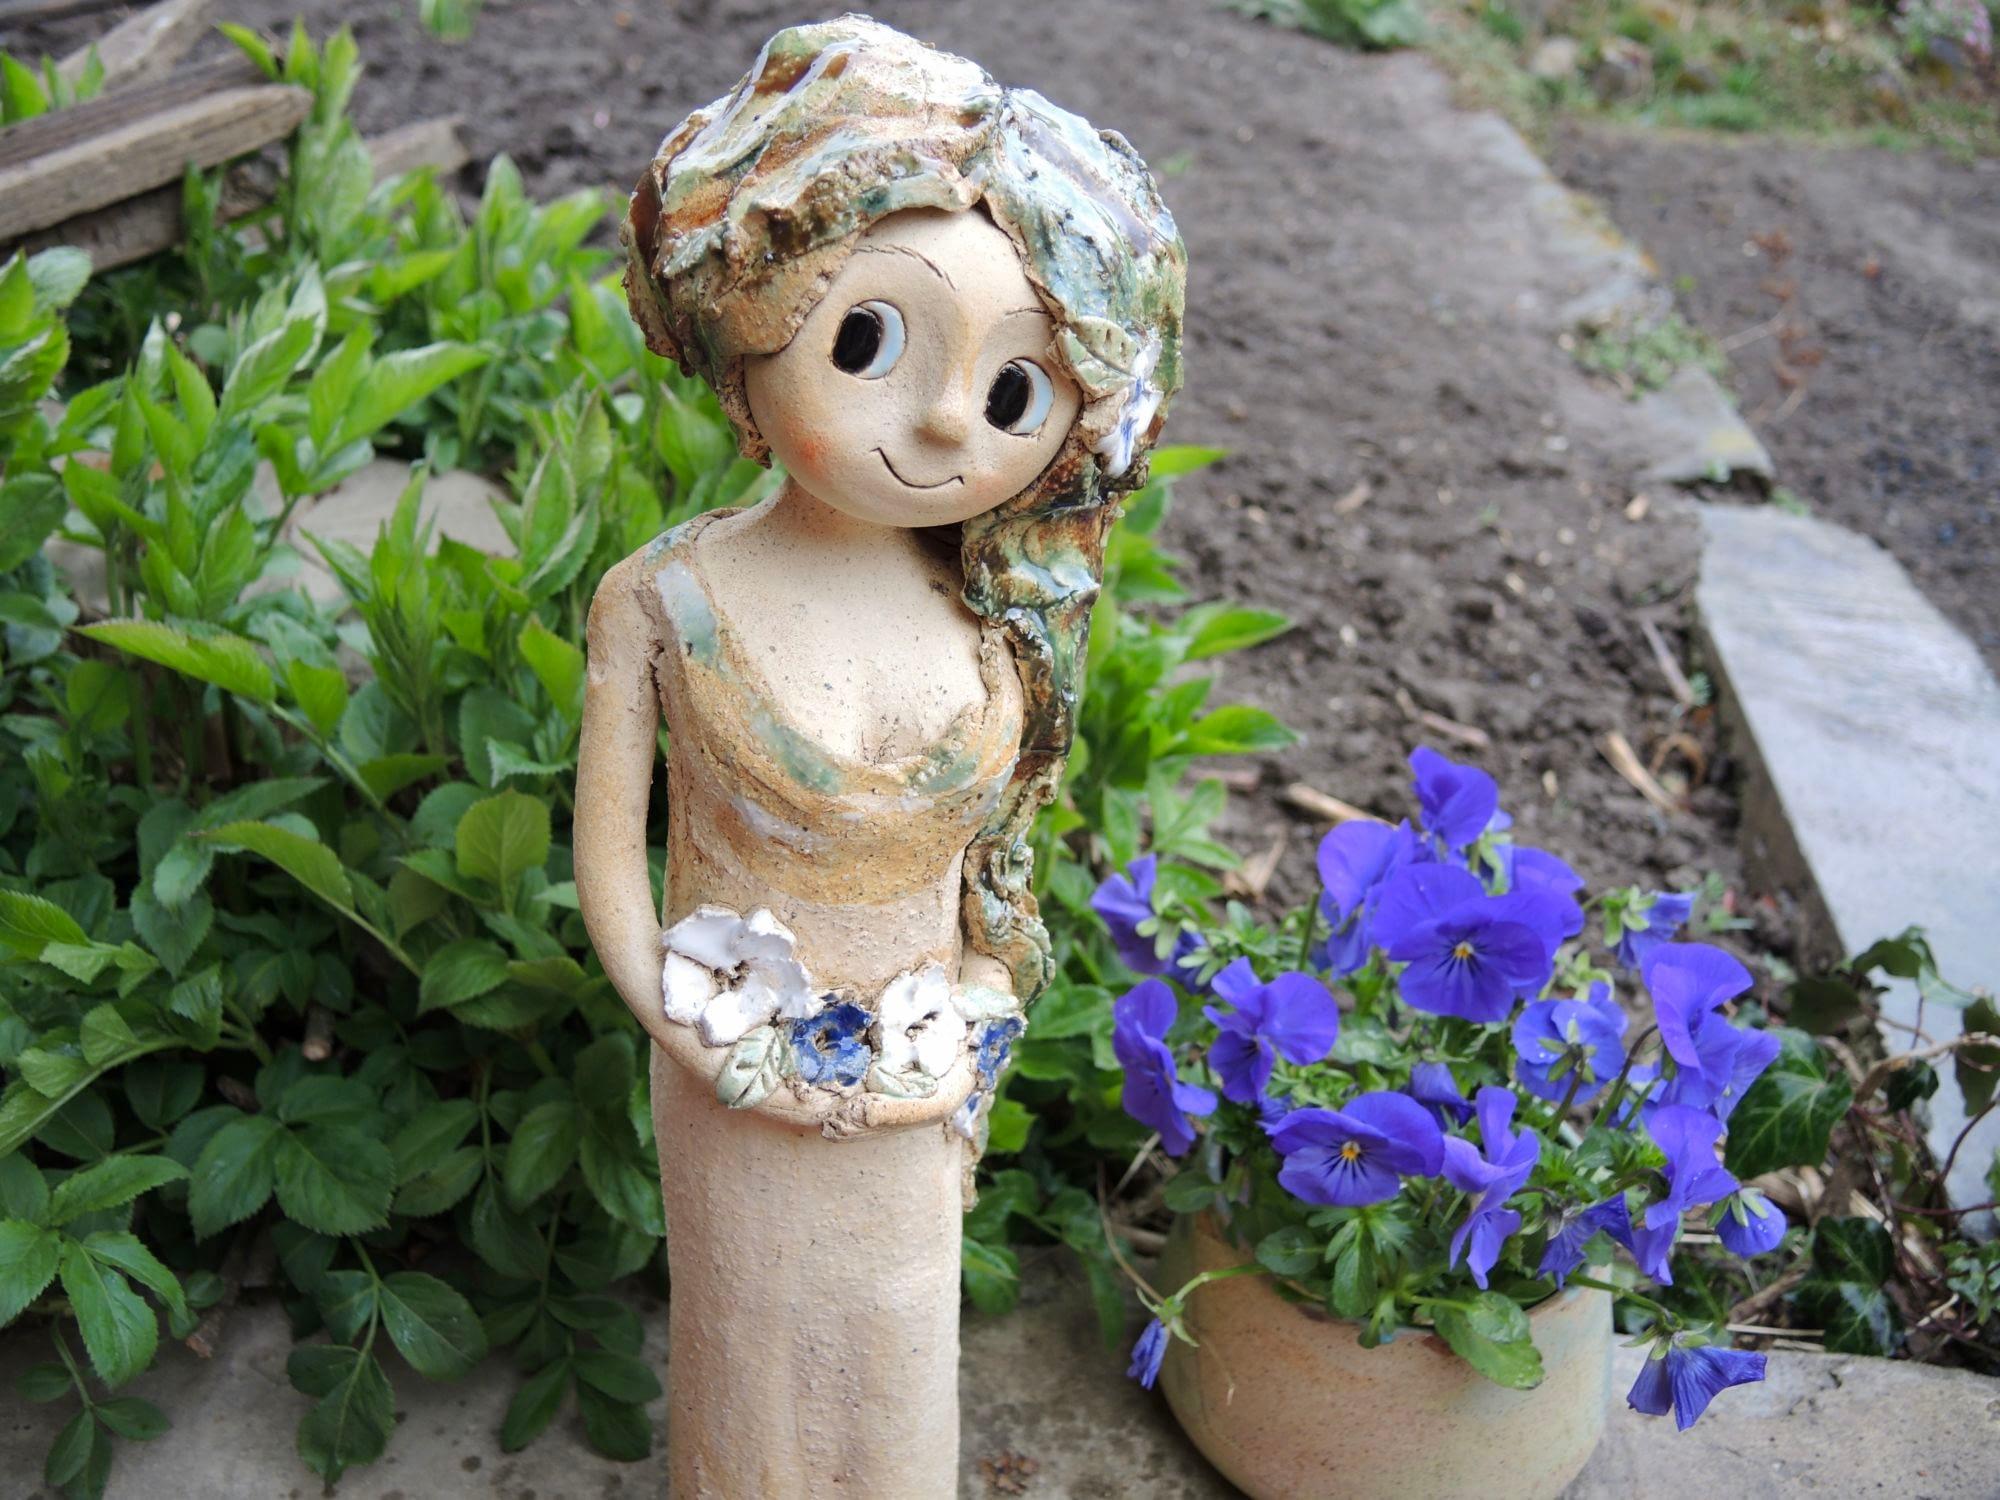 lesni víla květina strom keramika andee socha